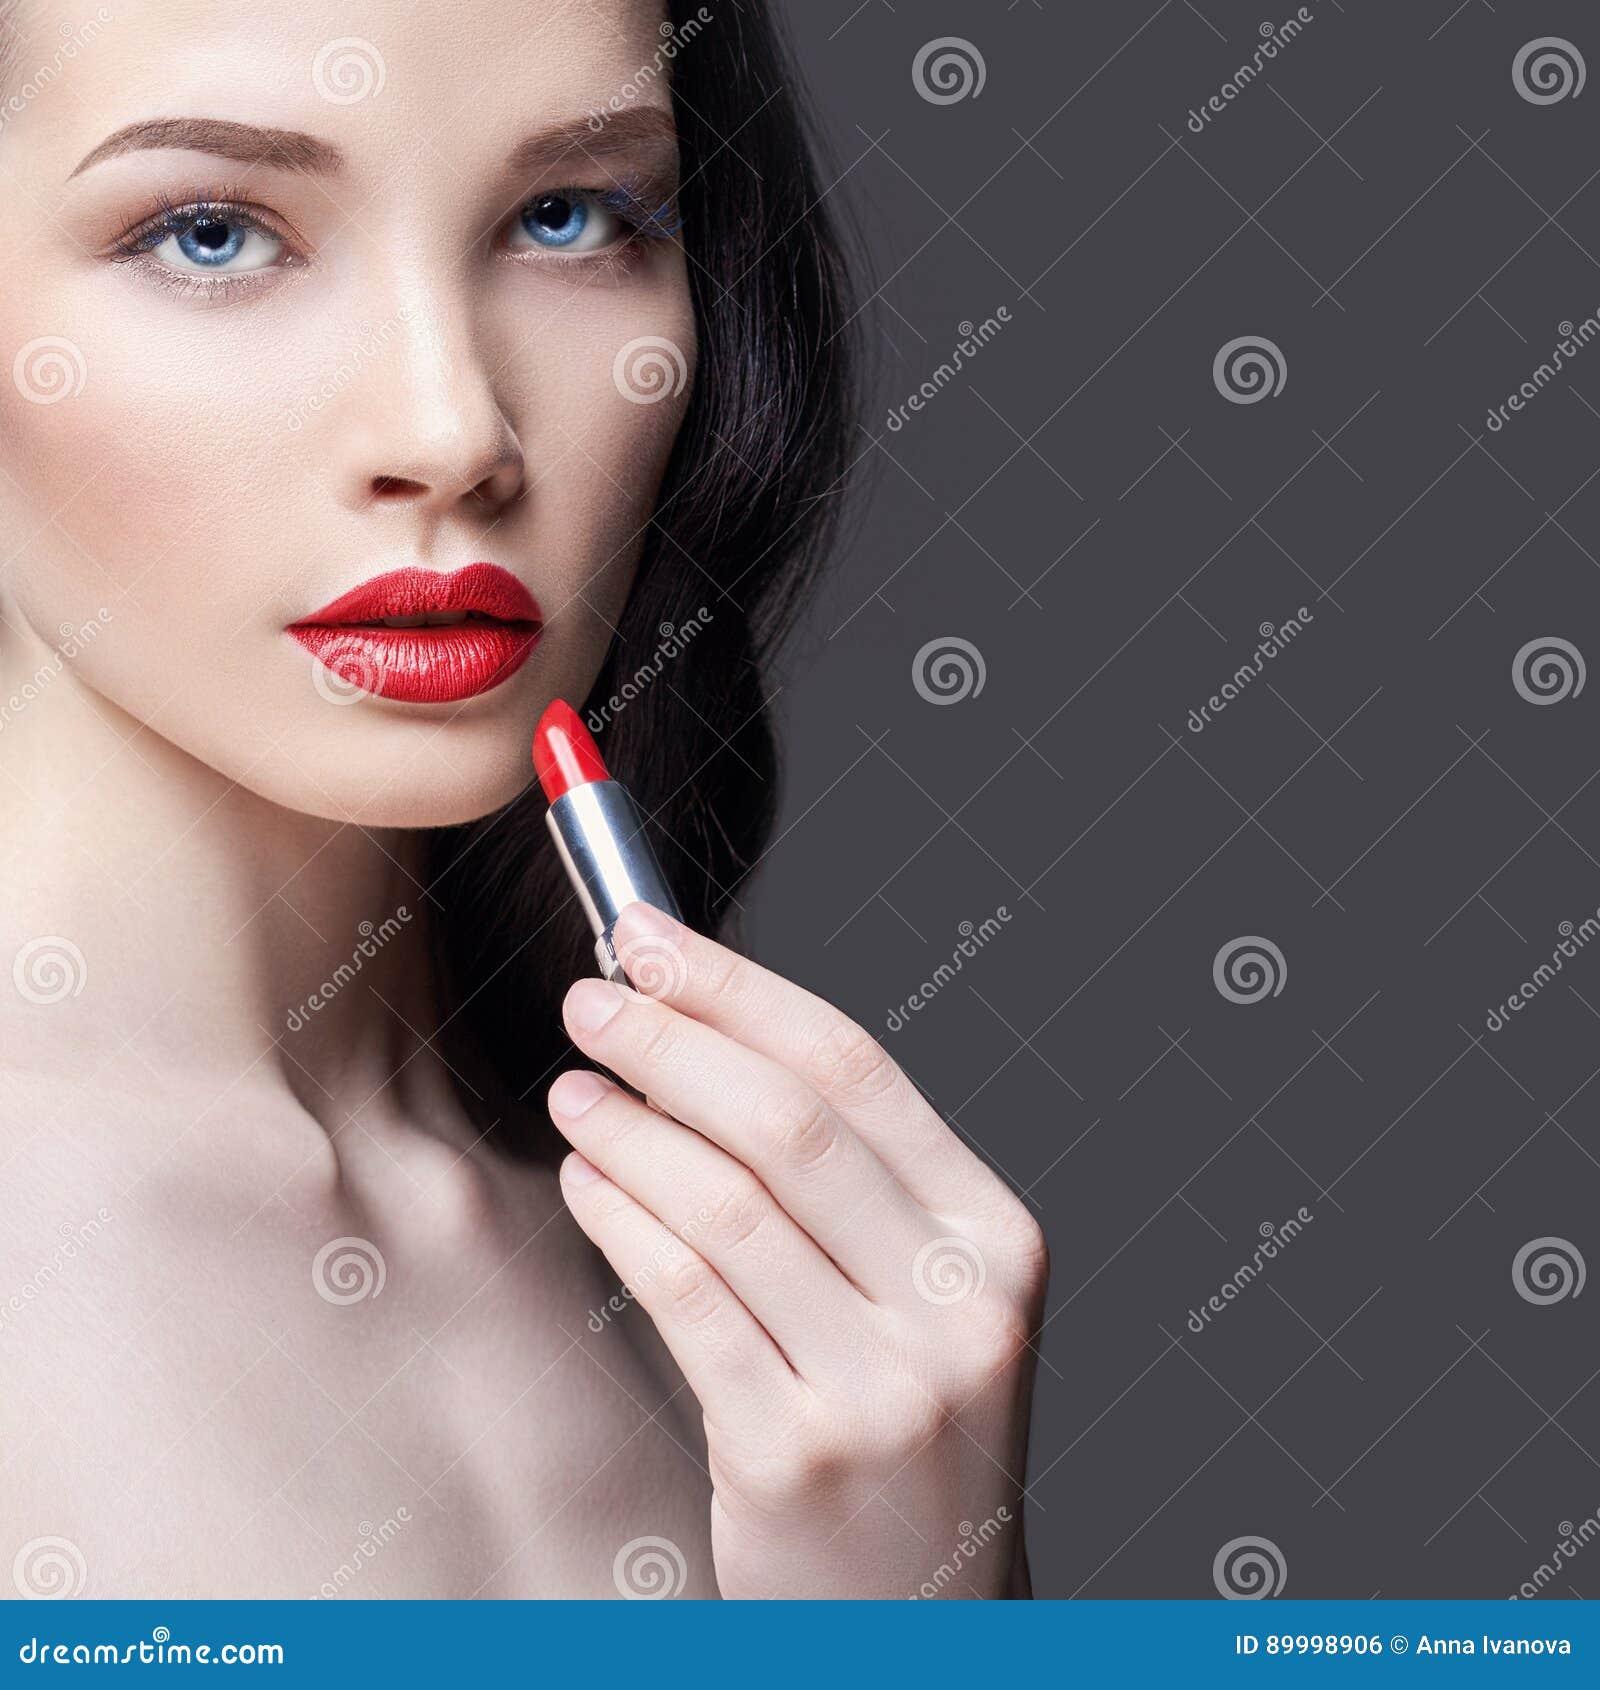 Sexy polish models nude high quality photos